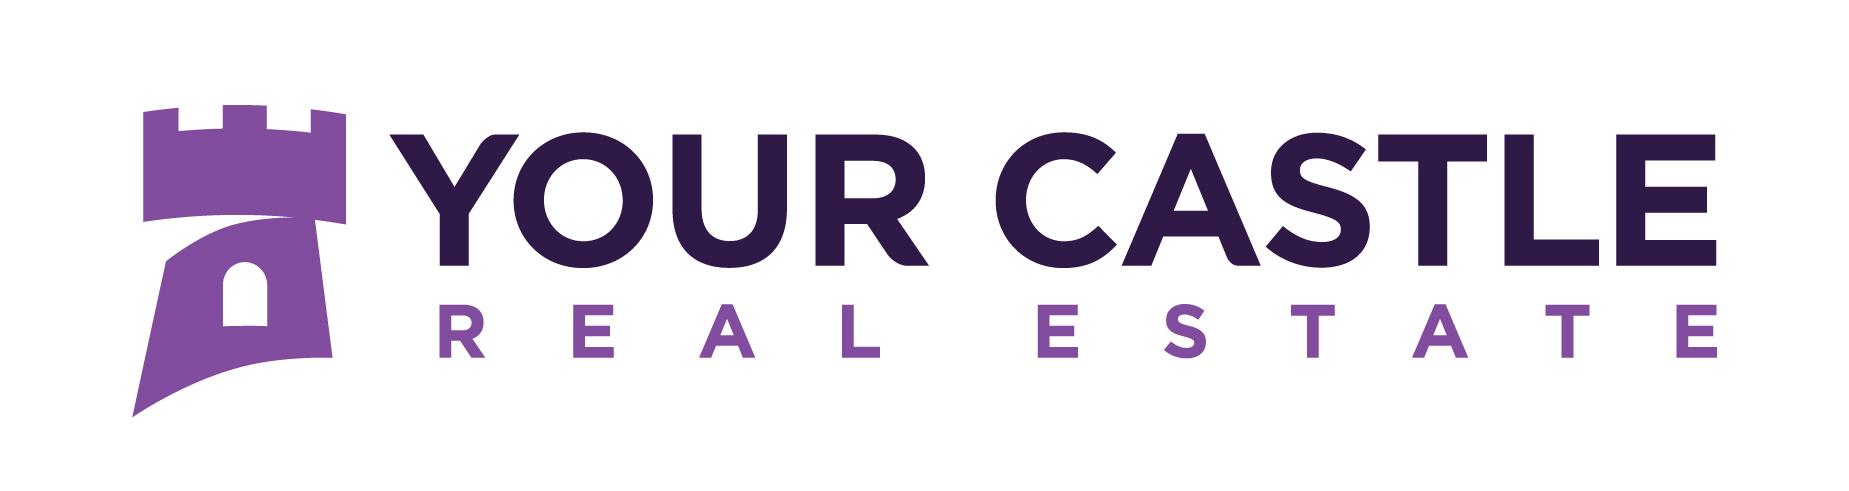 Your Castle Real Estate Inc